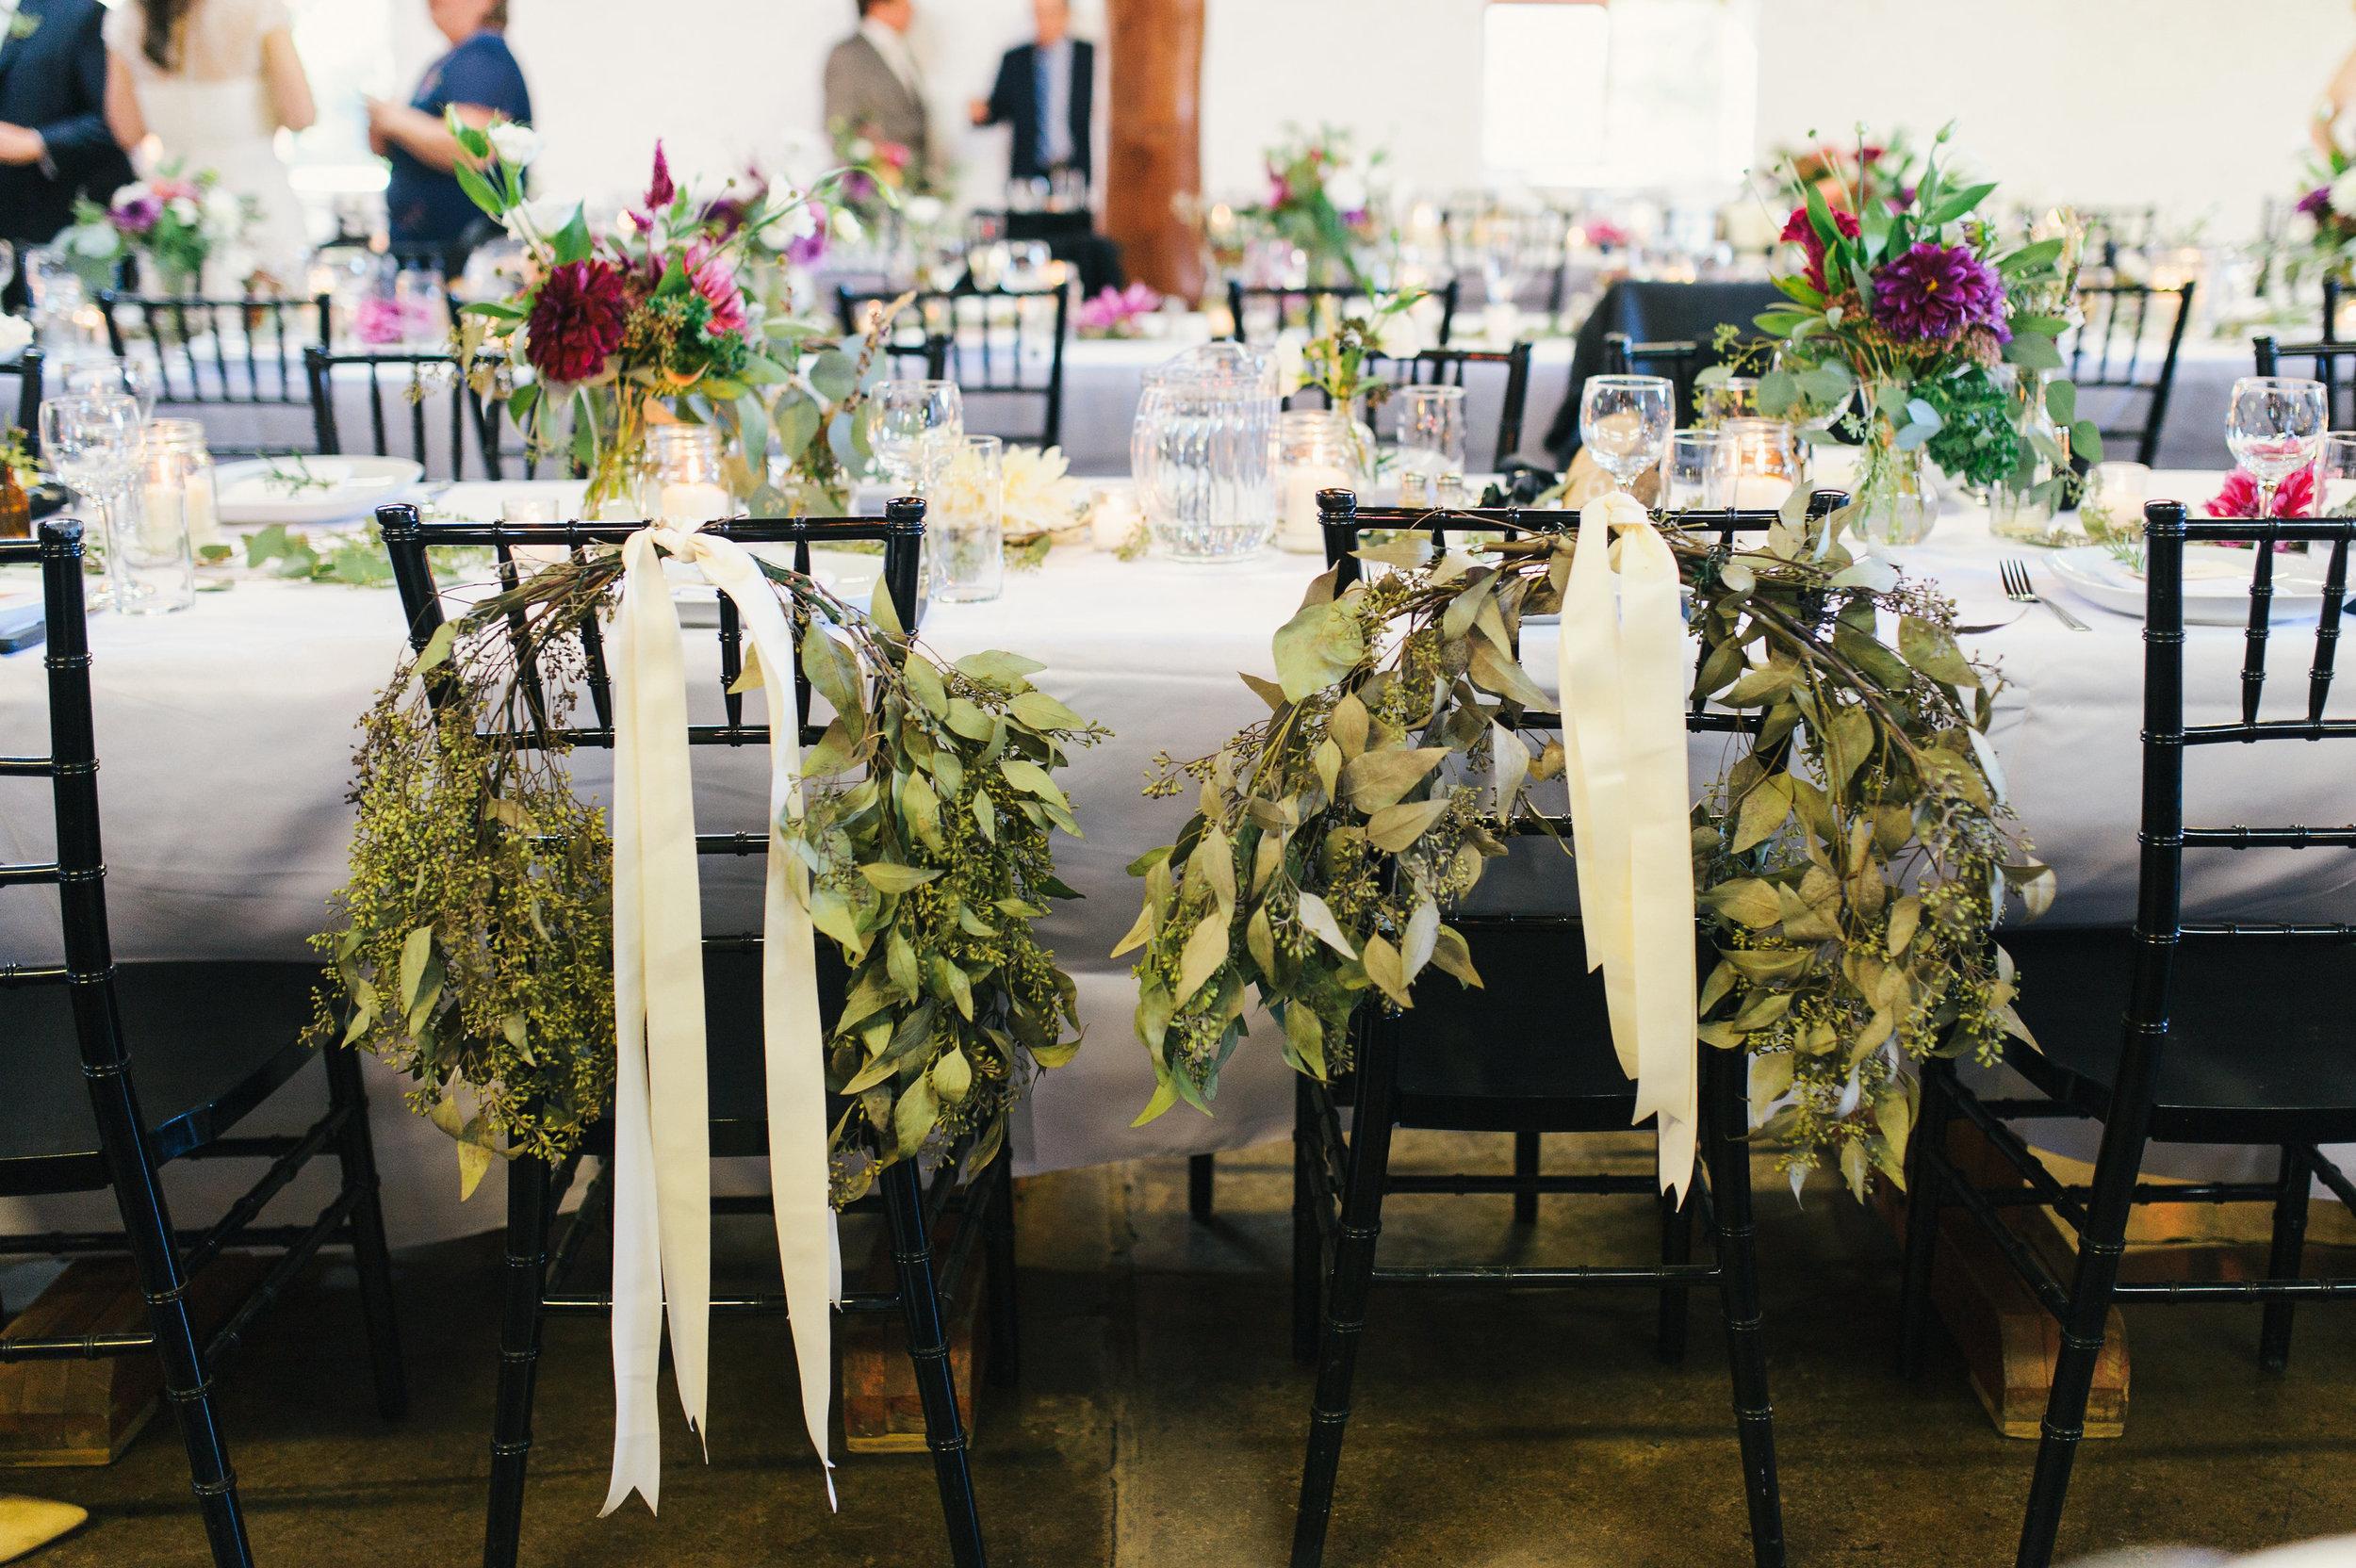 marial-daniel-wedding-balls-falls-sara-wilde-photography-0652.jpg